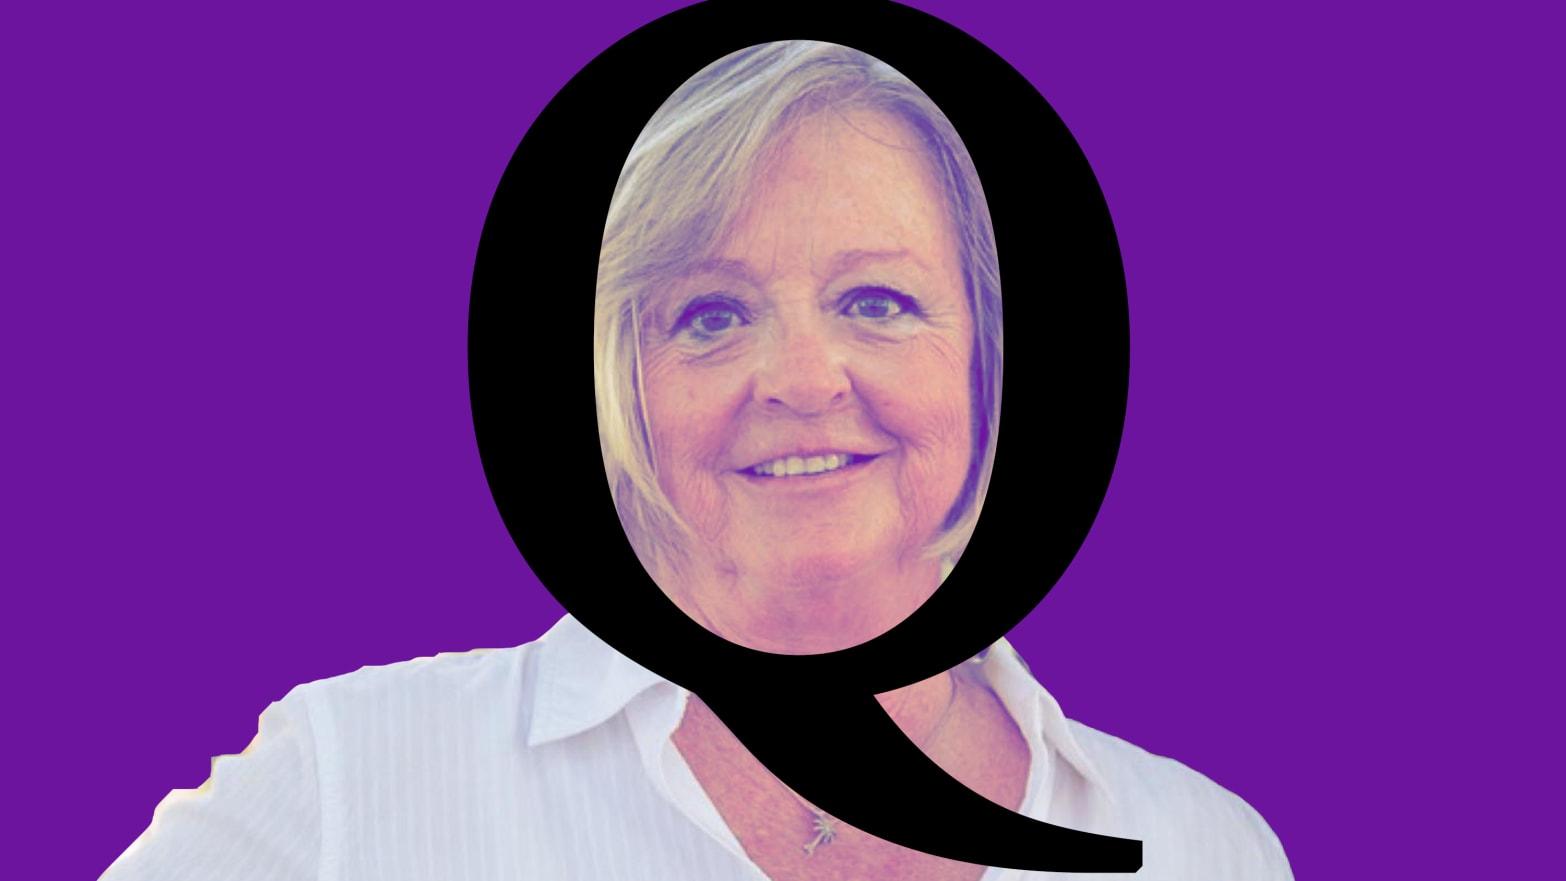 State Rep. Lin Bennett Endorses QAnon